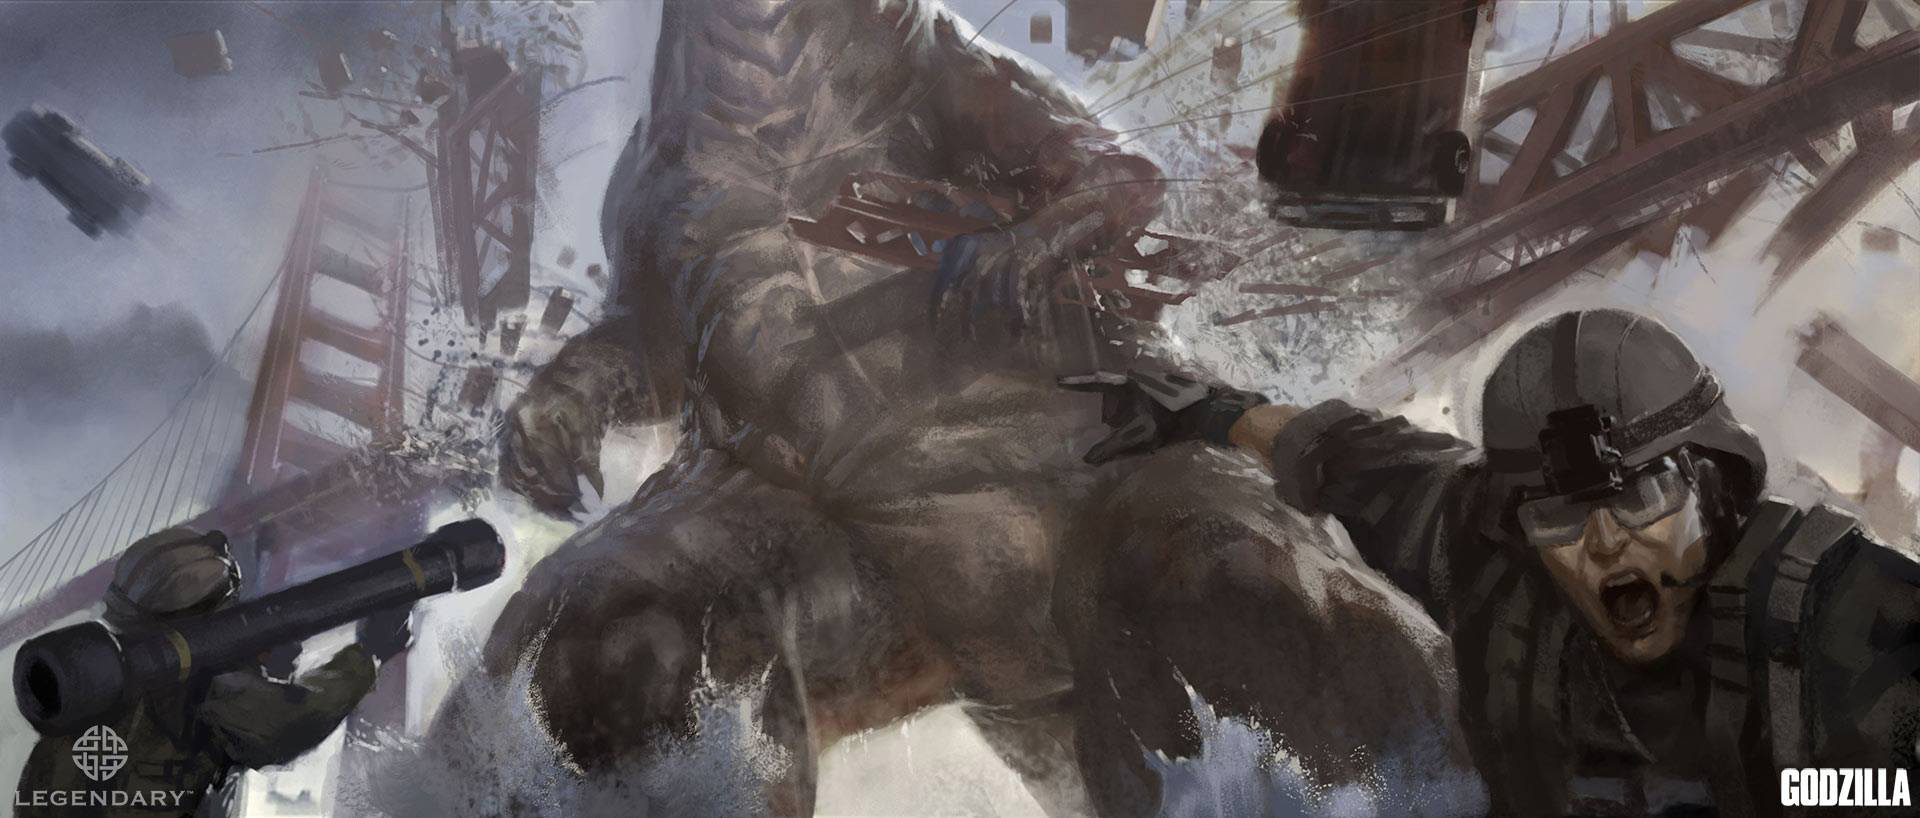 Godzilla concept art by kan muftic concept art world